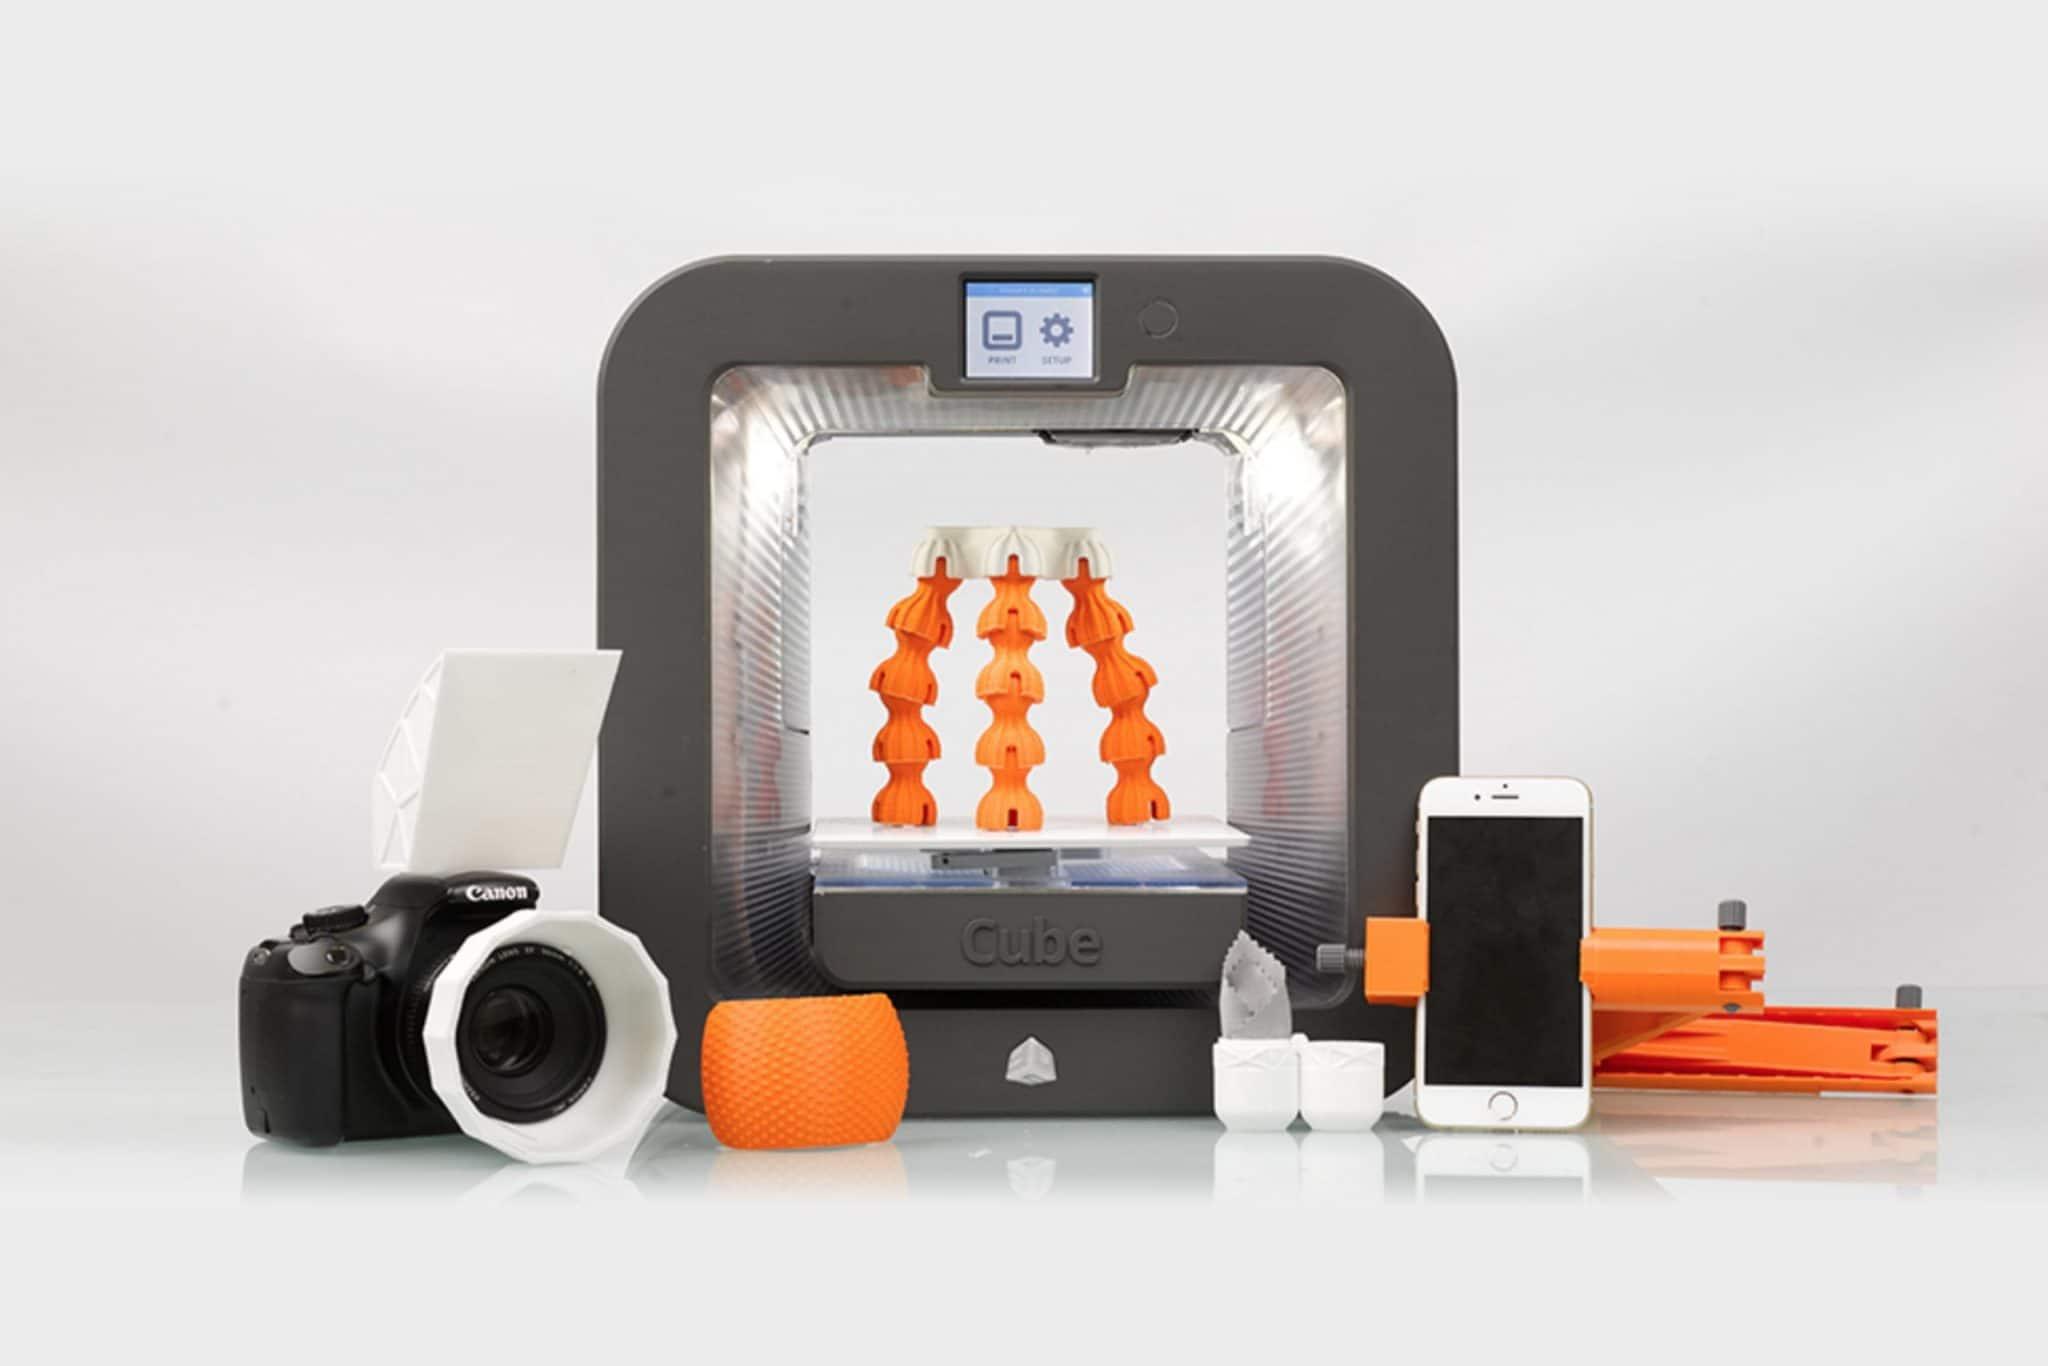 objet appareil photo impression 3D